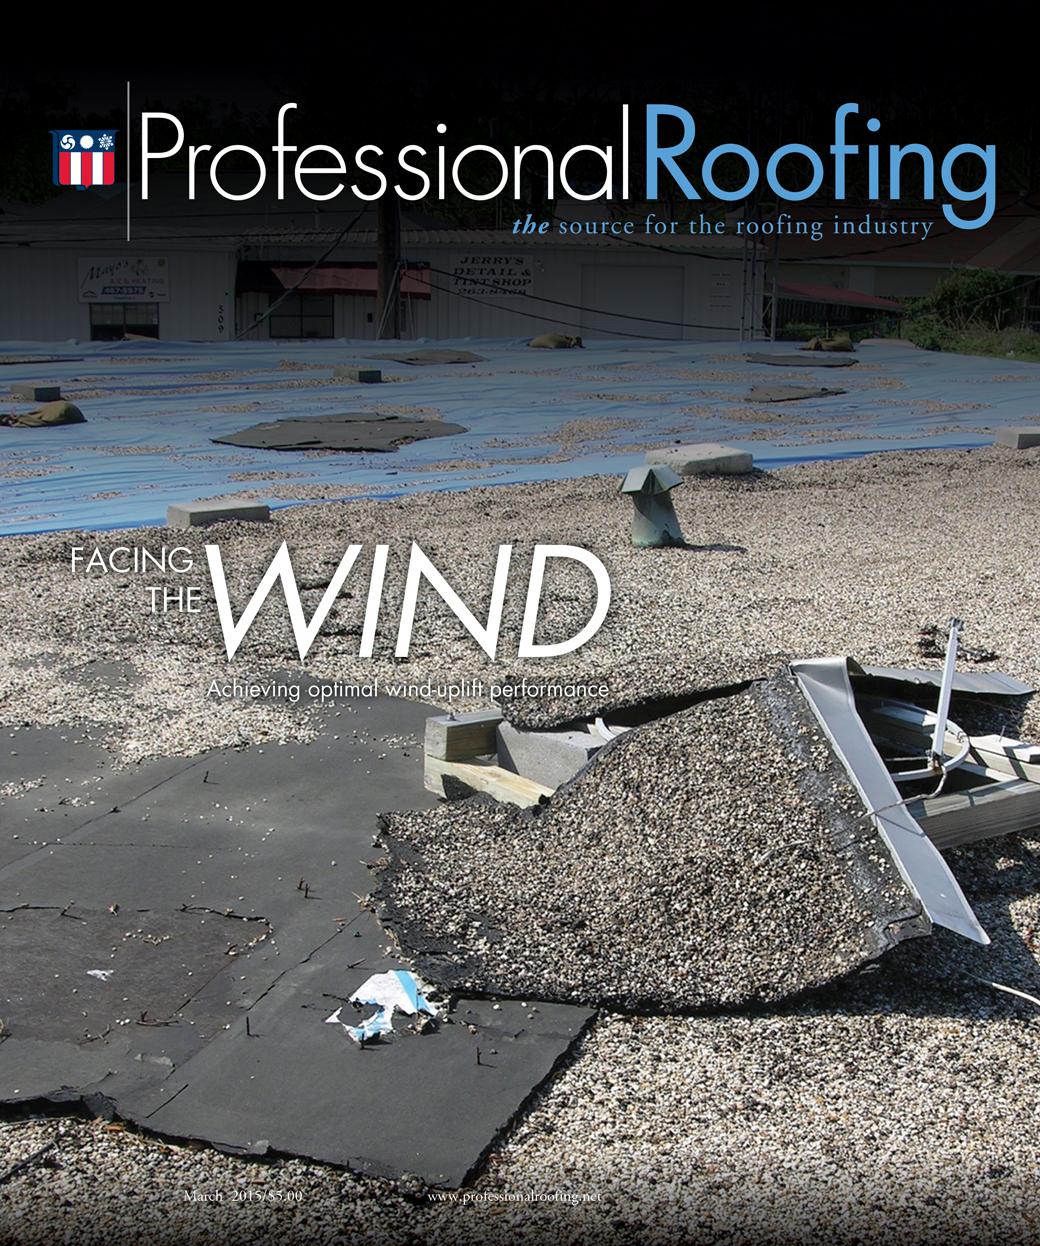 Professional Roofing Magazine 3/1/2015